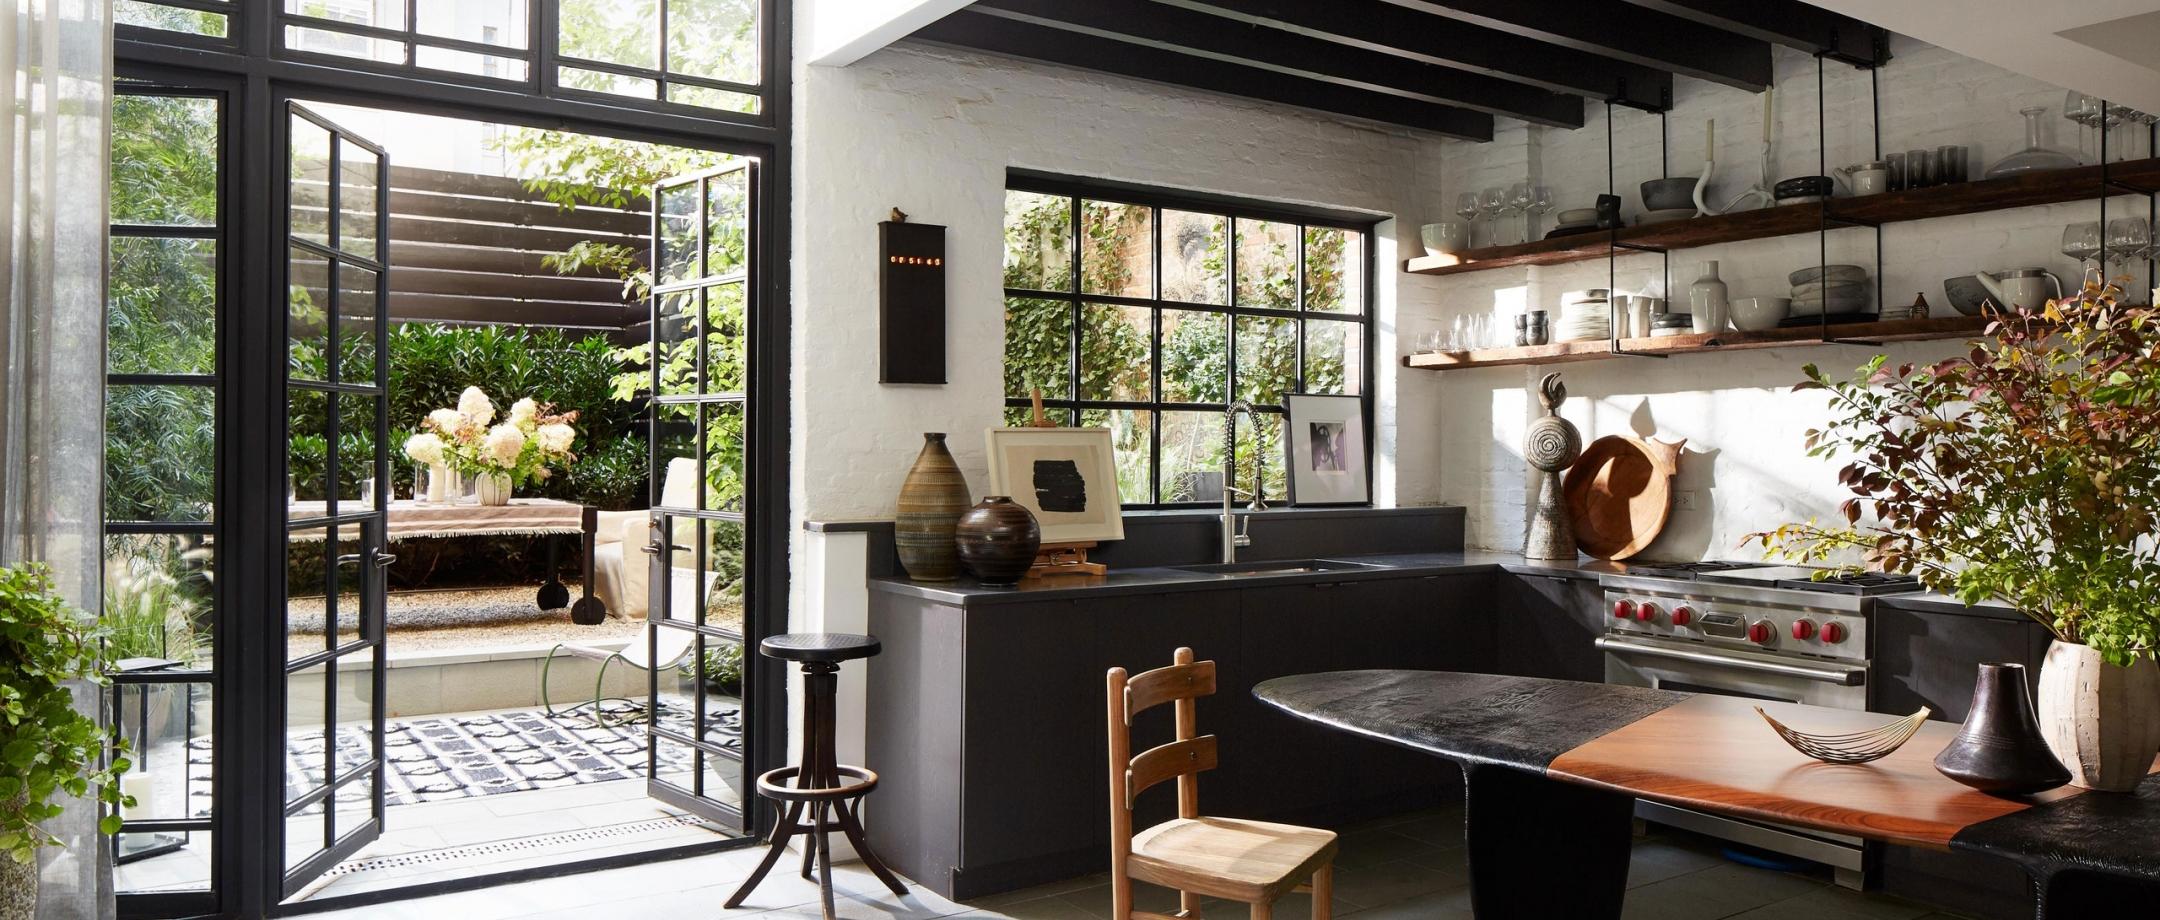 East Village Atelier